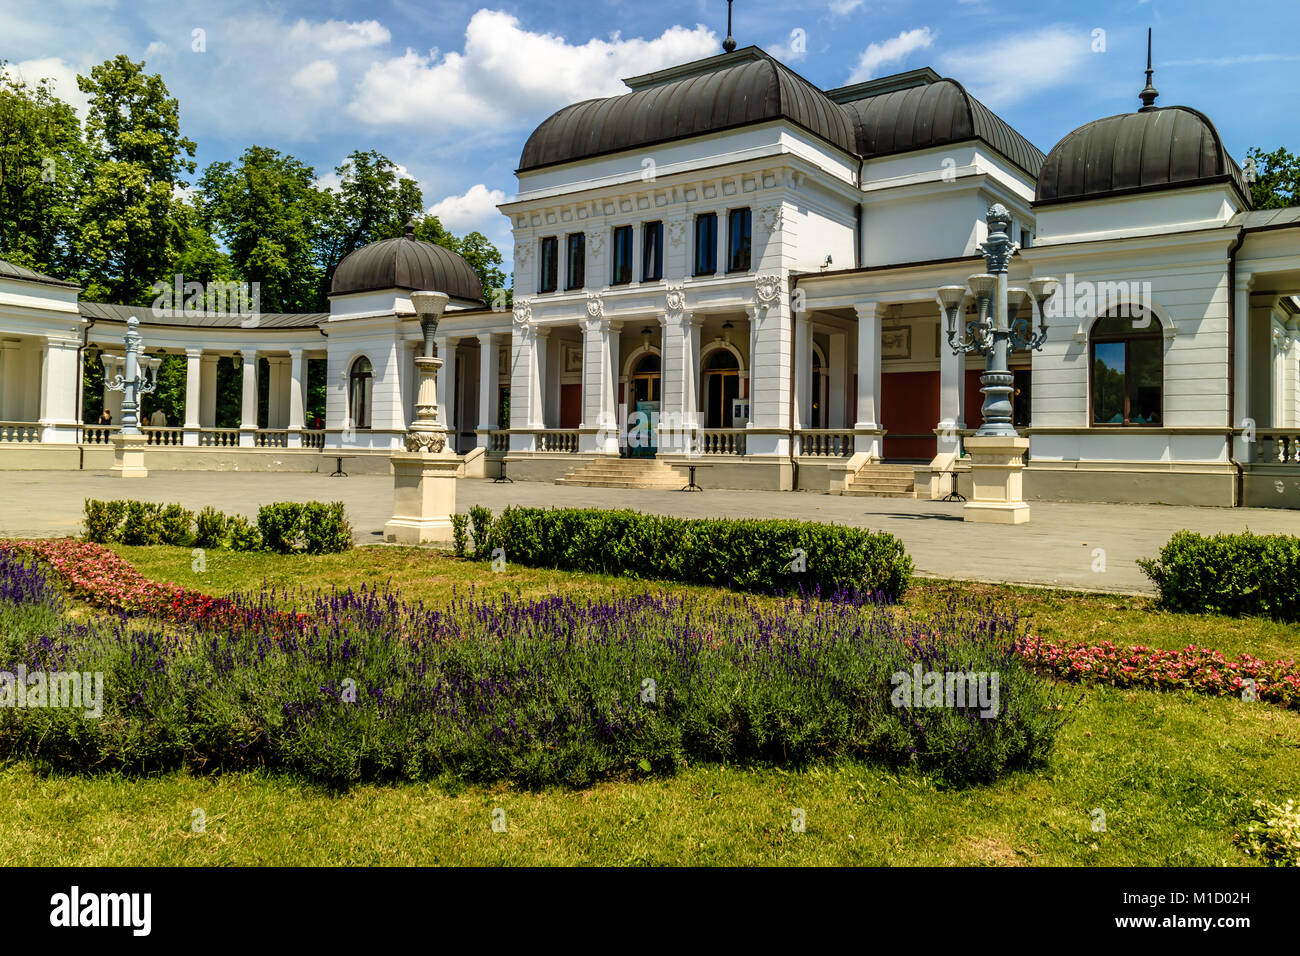 Gebäude casino in Simion Barnutiu Central Park, Cluj-Napoca, Rumänien. Juni 2017. Stockfoto